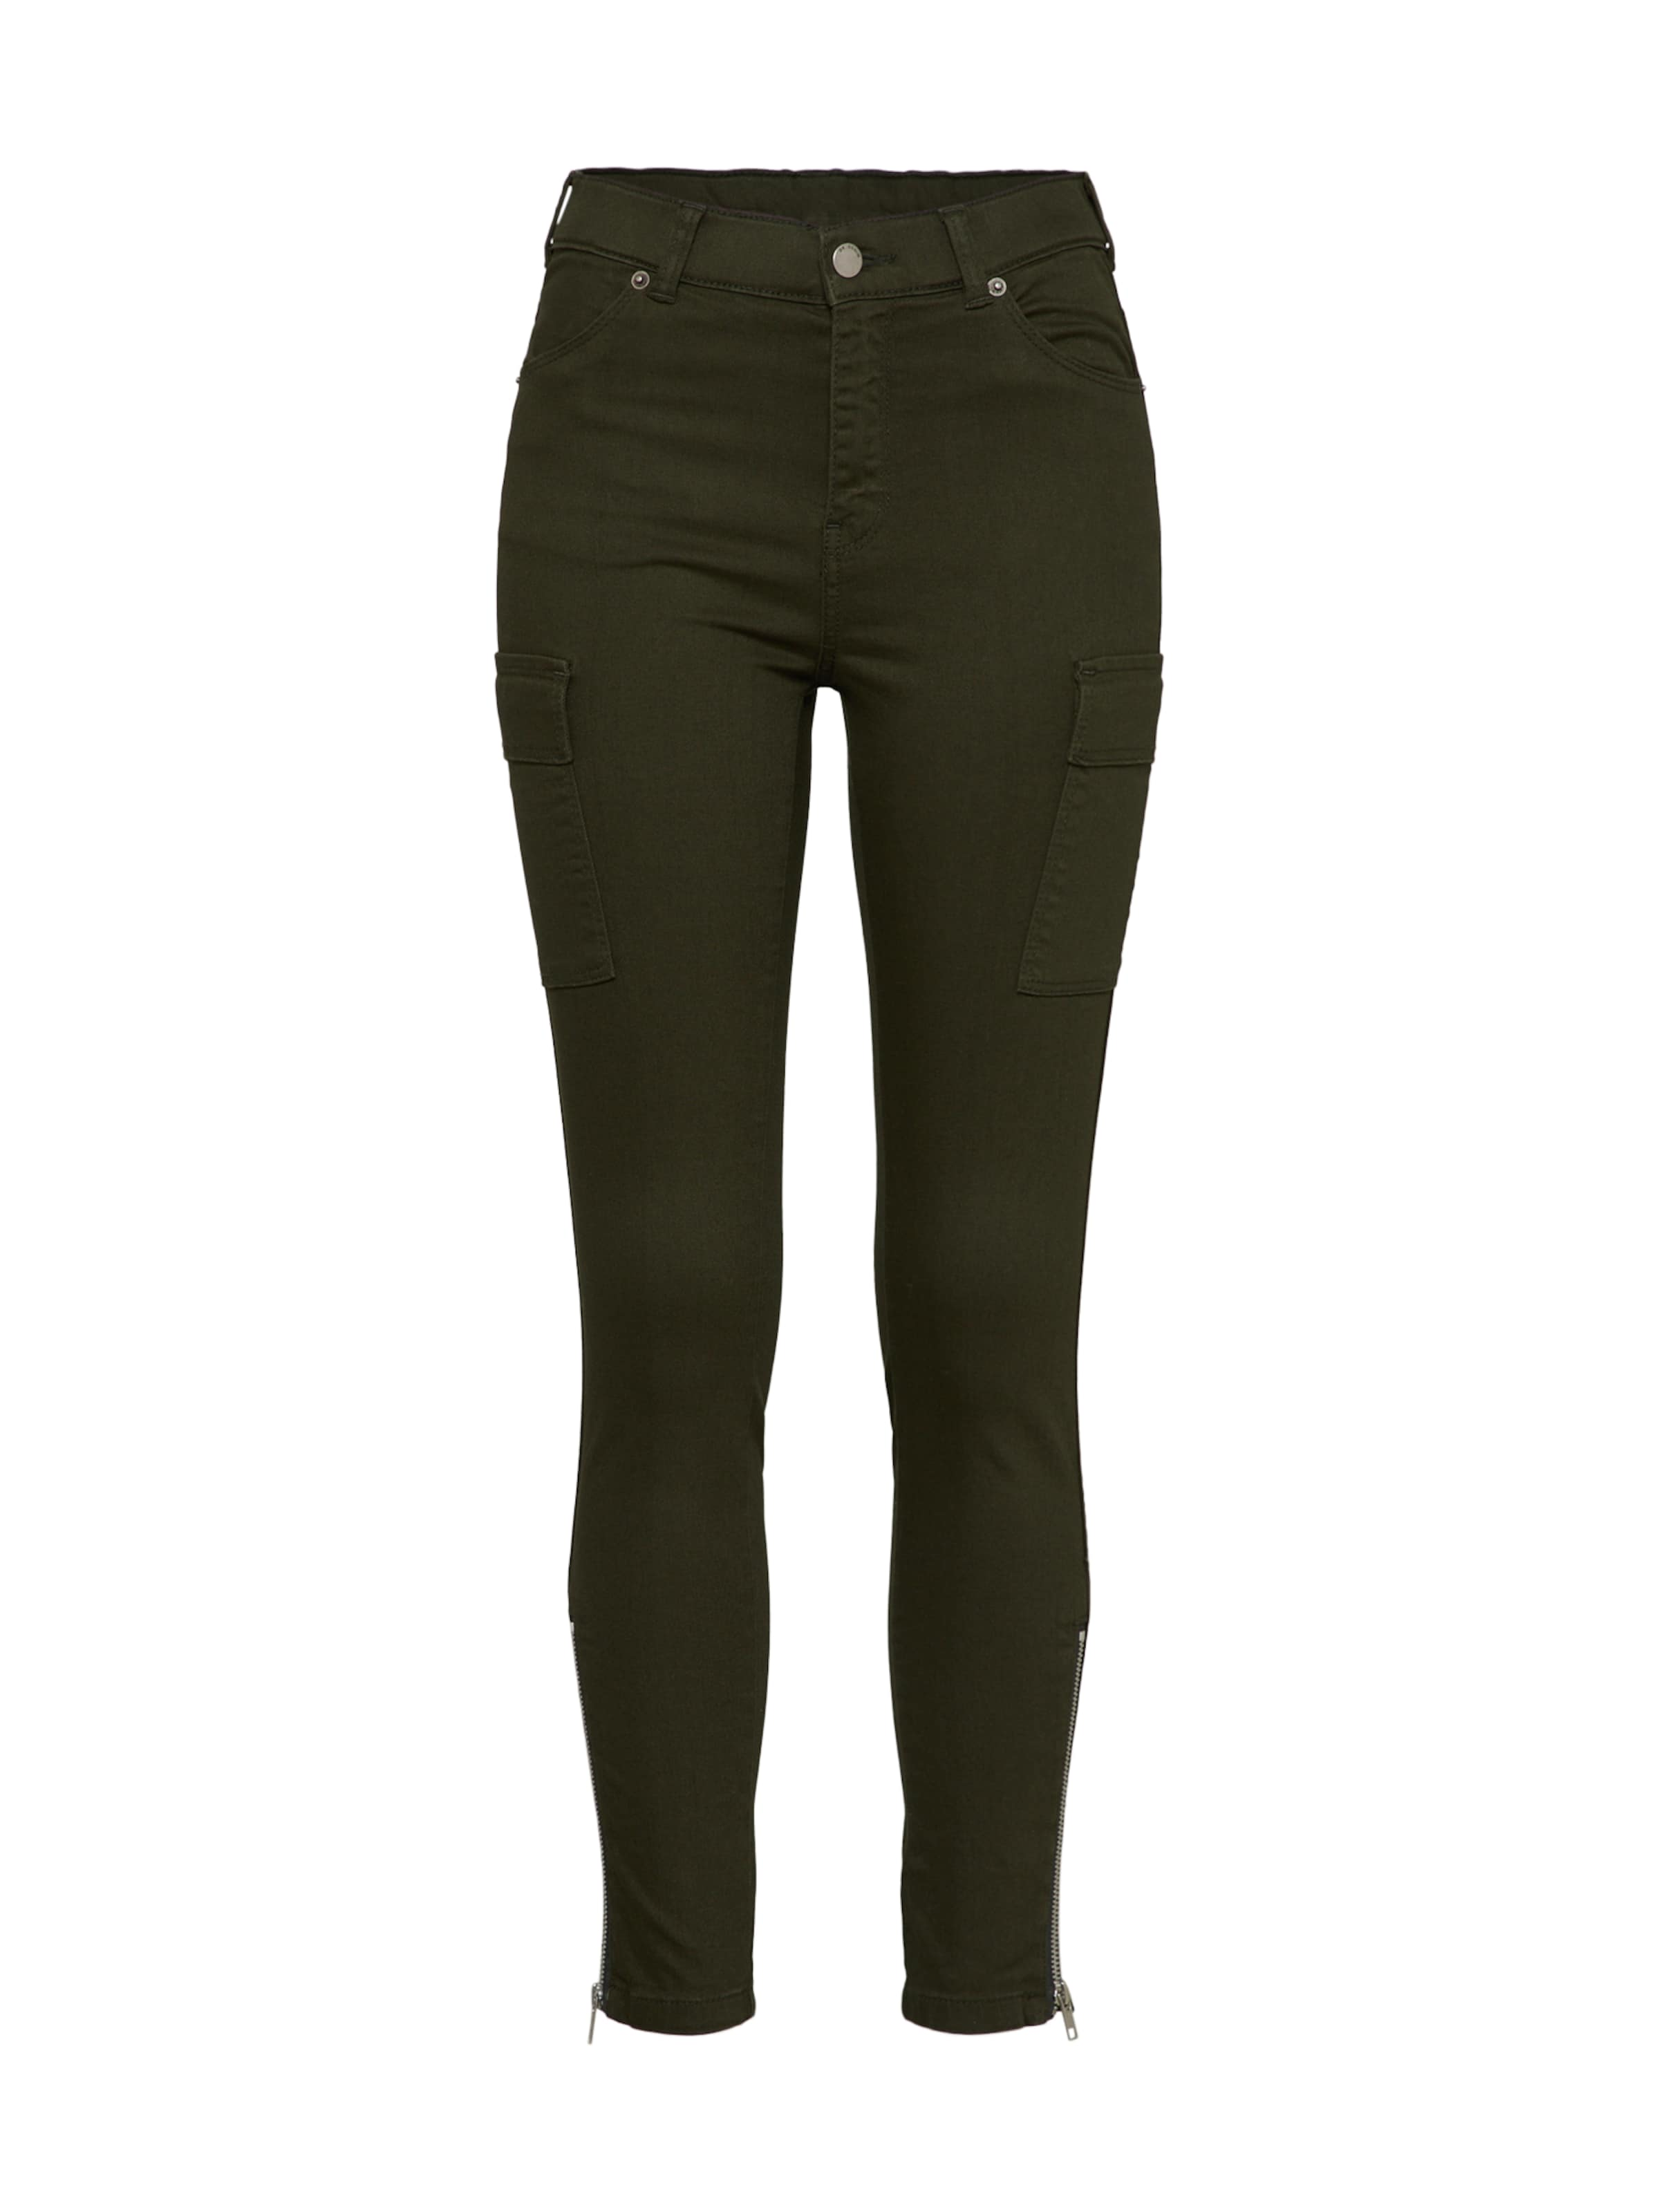 In Fit Slim Grün 'dezie' DrDenim Jeans yPvN8Onm0w